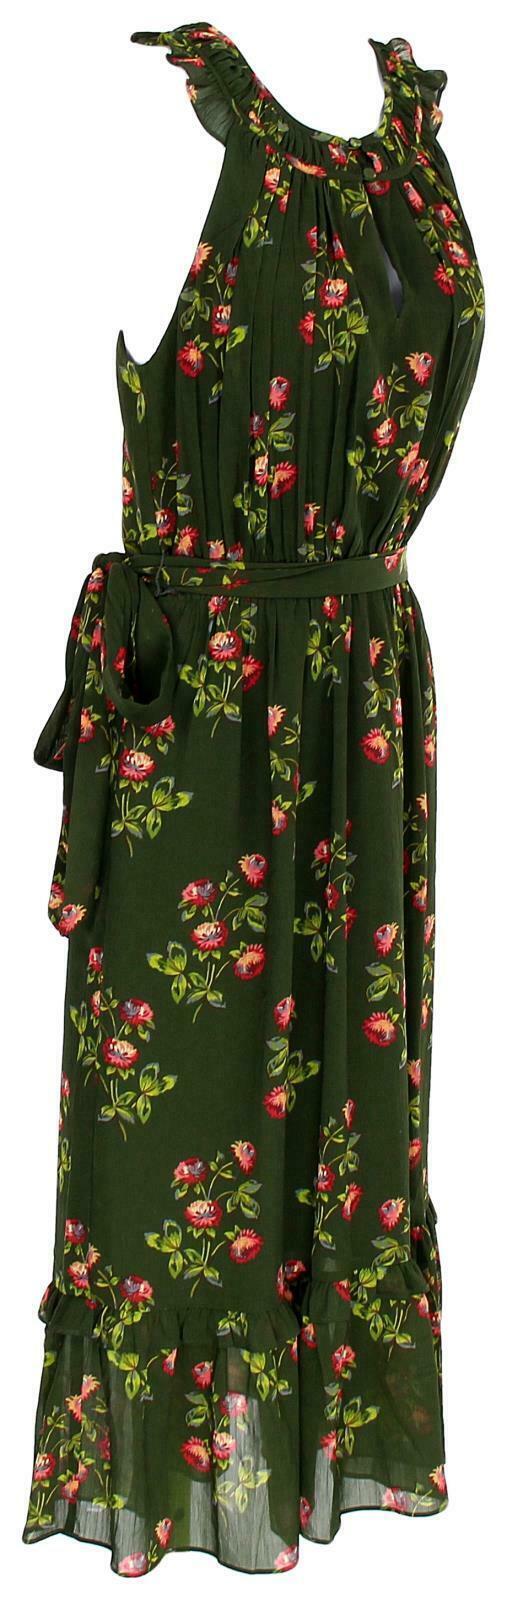 J Crew Women's Point Sur High-Neck Ruffle Floral Dress Chiffon 4 J5088 image 2